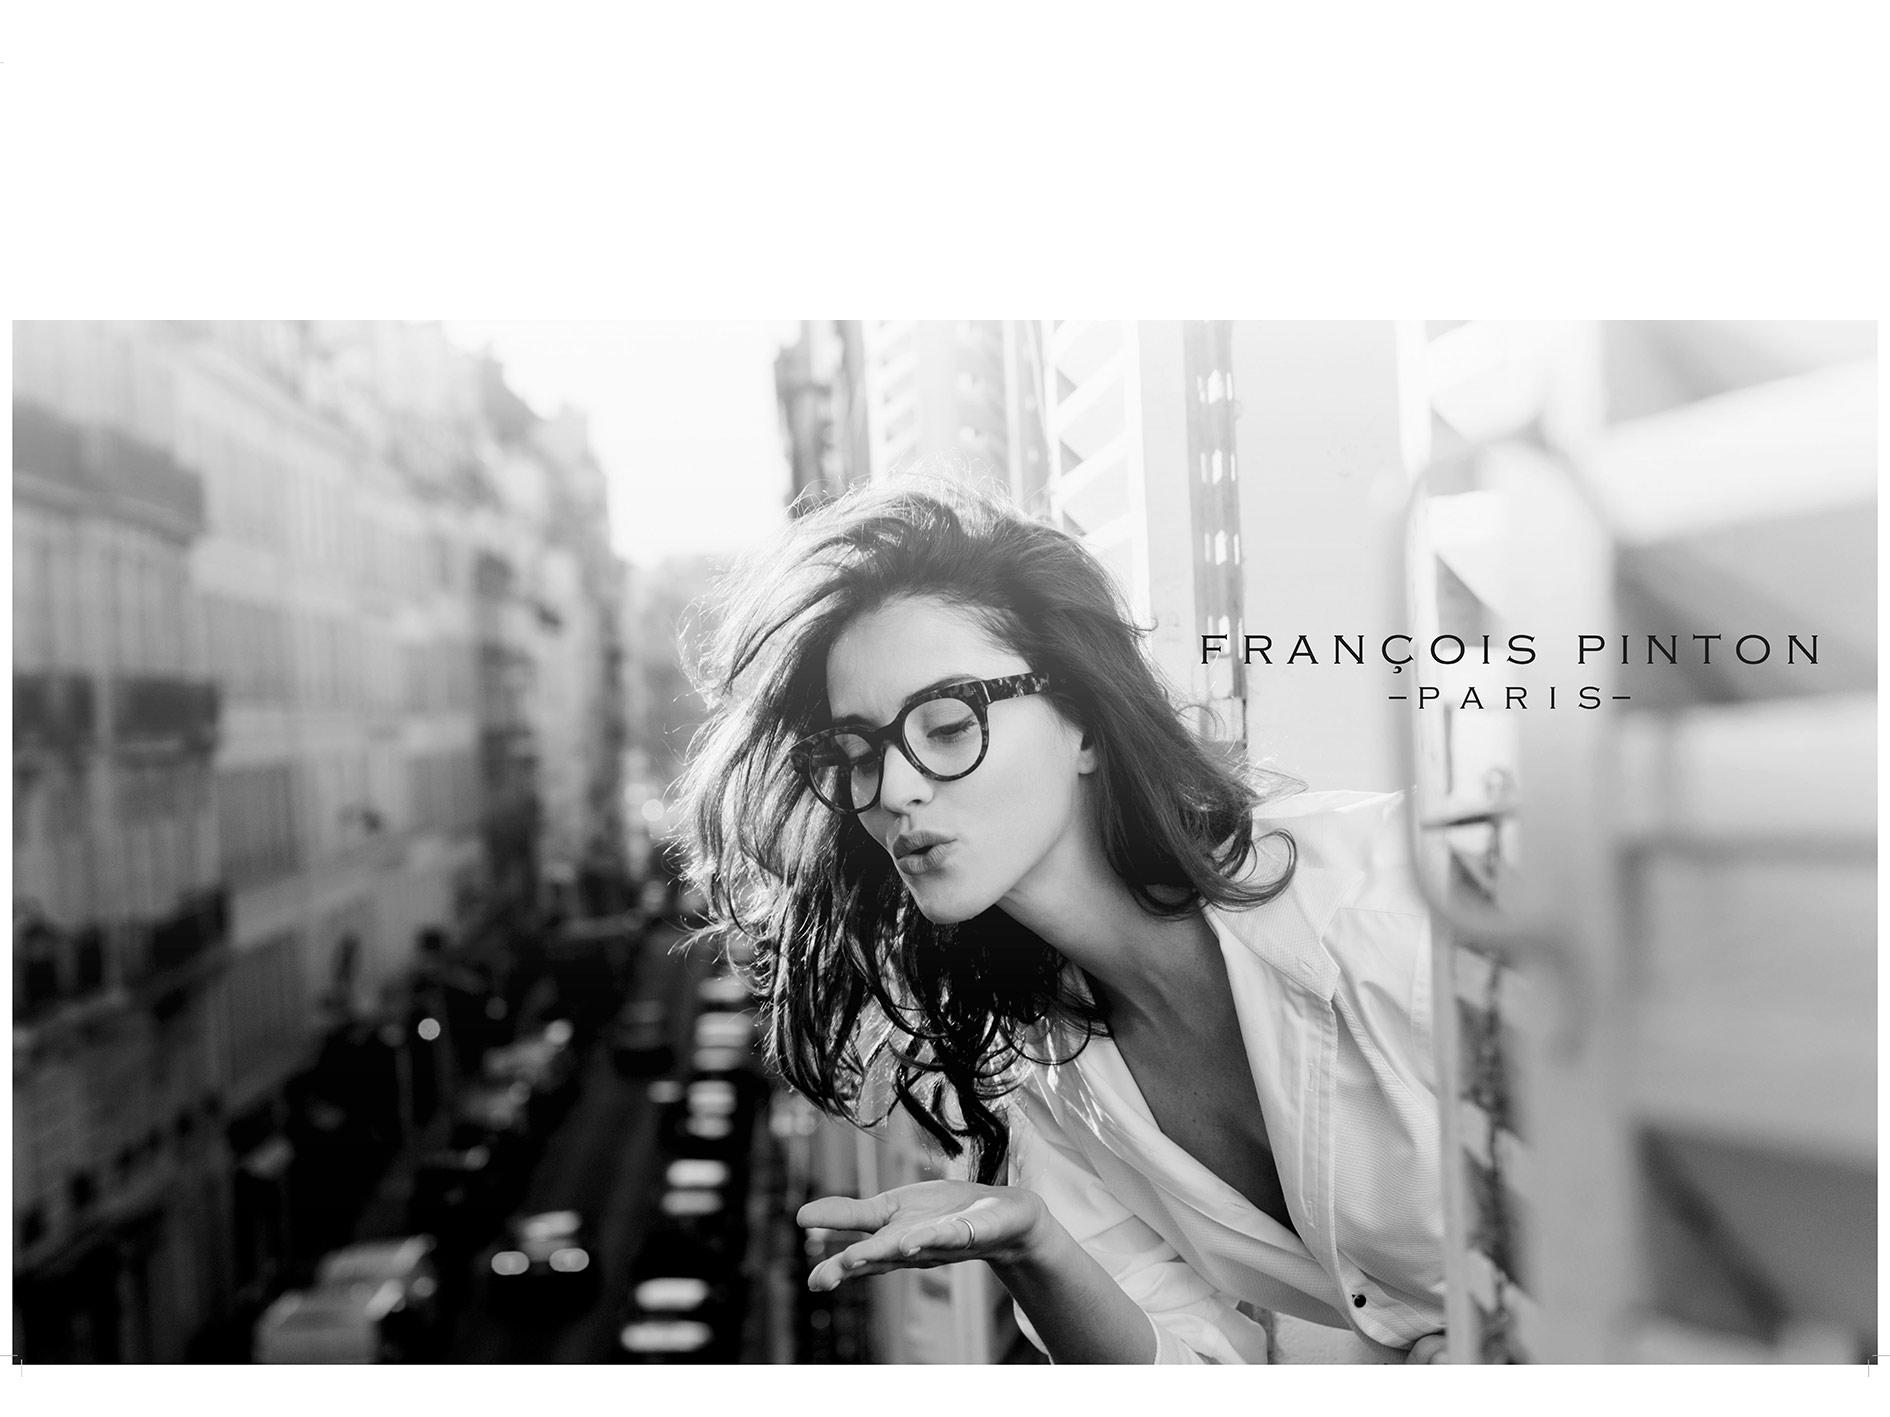 Visuels_Pinton_70x100-GA (1) 3